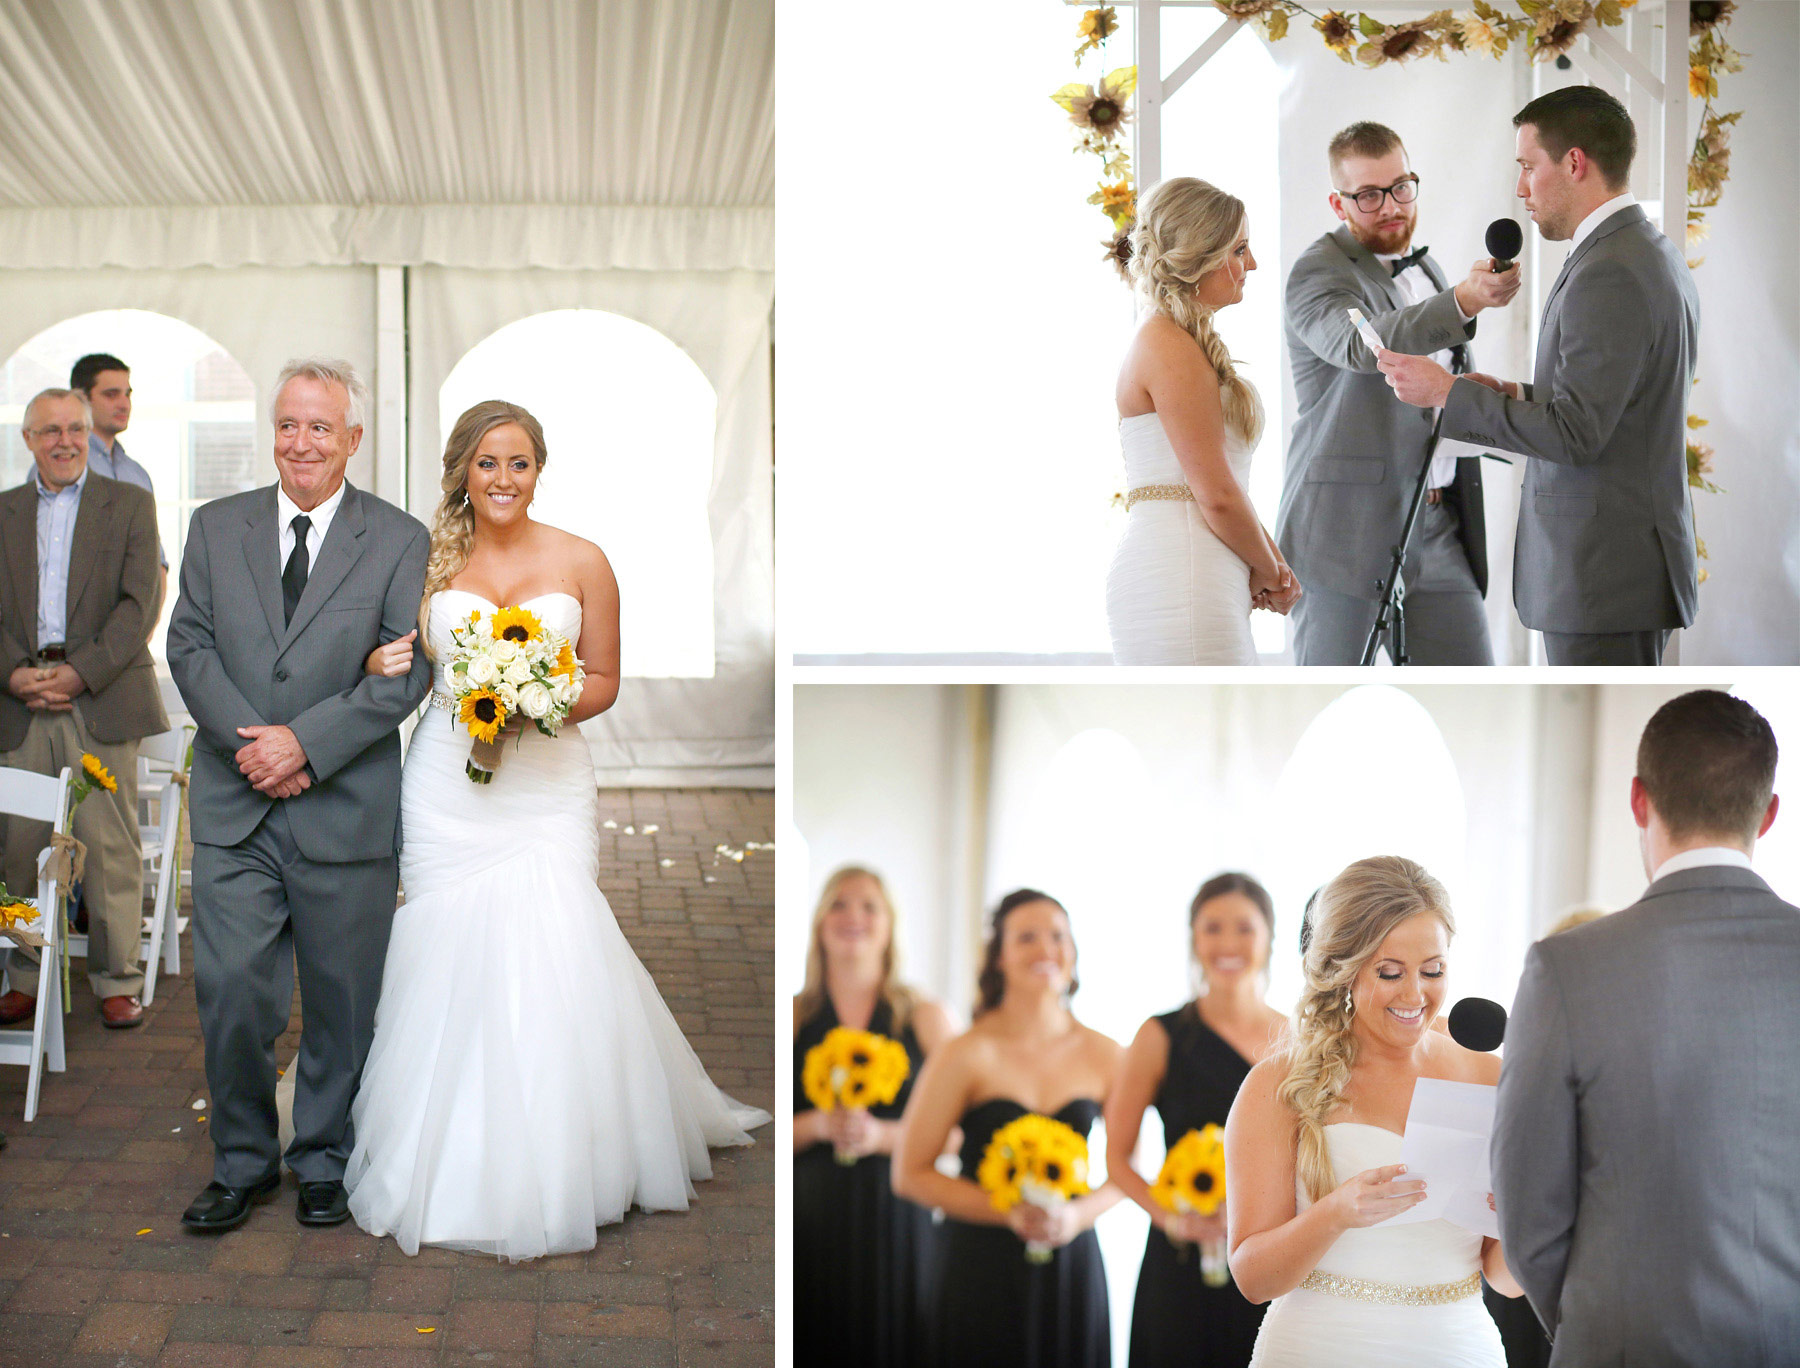 16-Stillwater-Minnesota-Wedding-Photographer-by-Andrew-Vick-Photography-Fall-Autumn-StoneRidge-Golf-Club-Ceremony-Bride-Groom-Father-Parents-Processional-Vows-Micaela-and-Derek.jpg